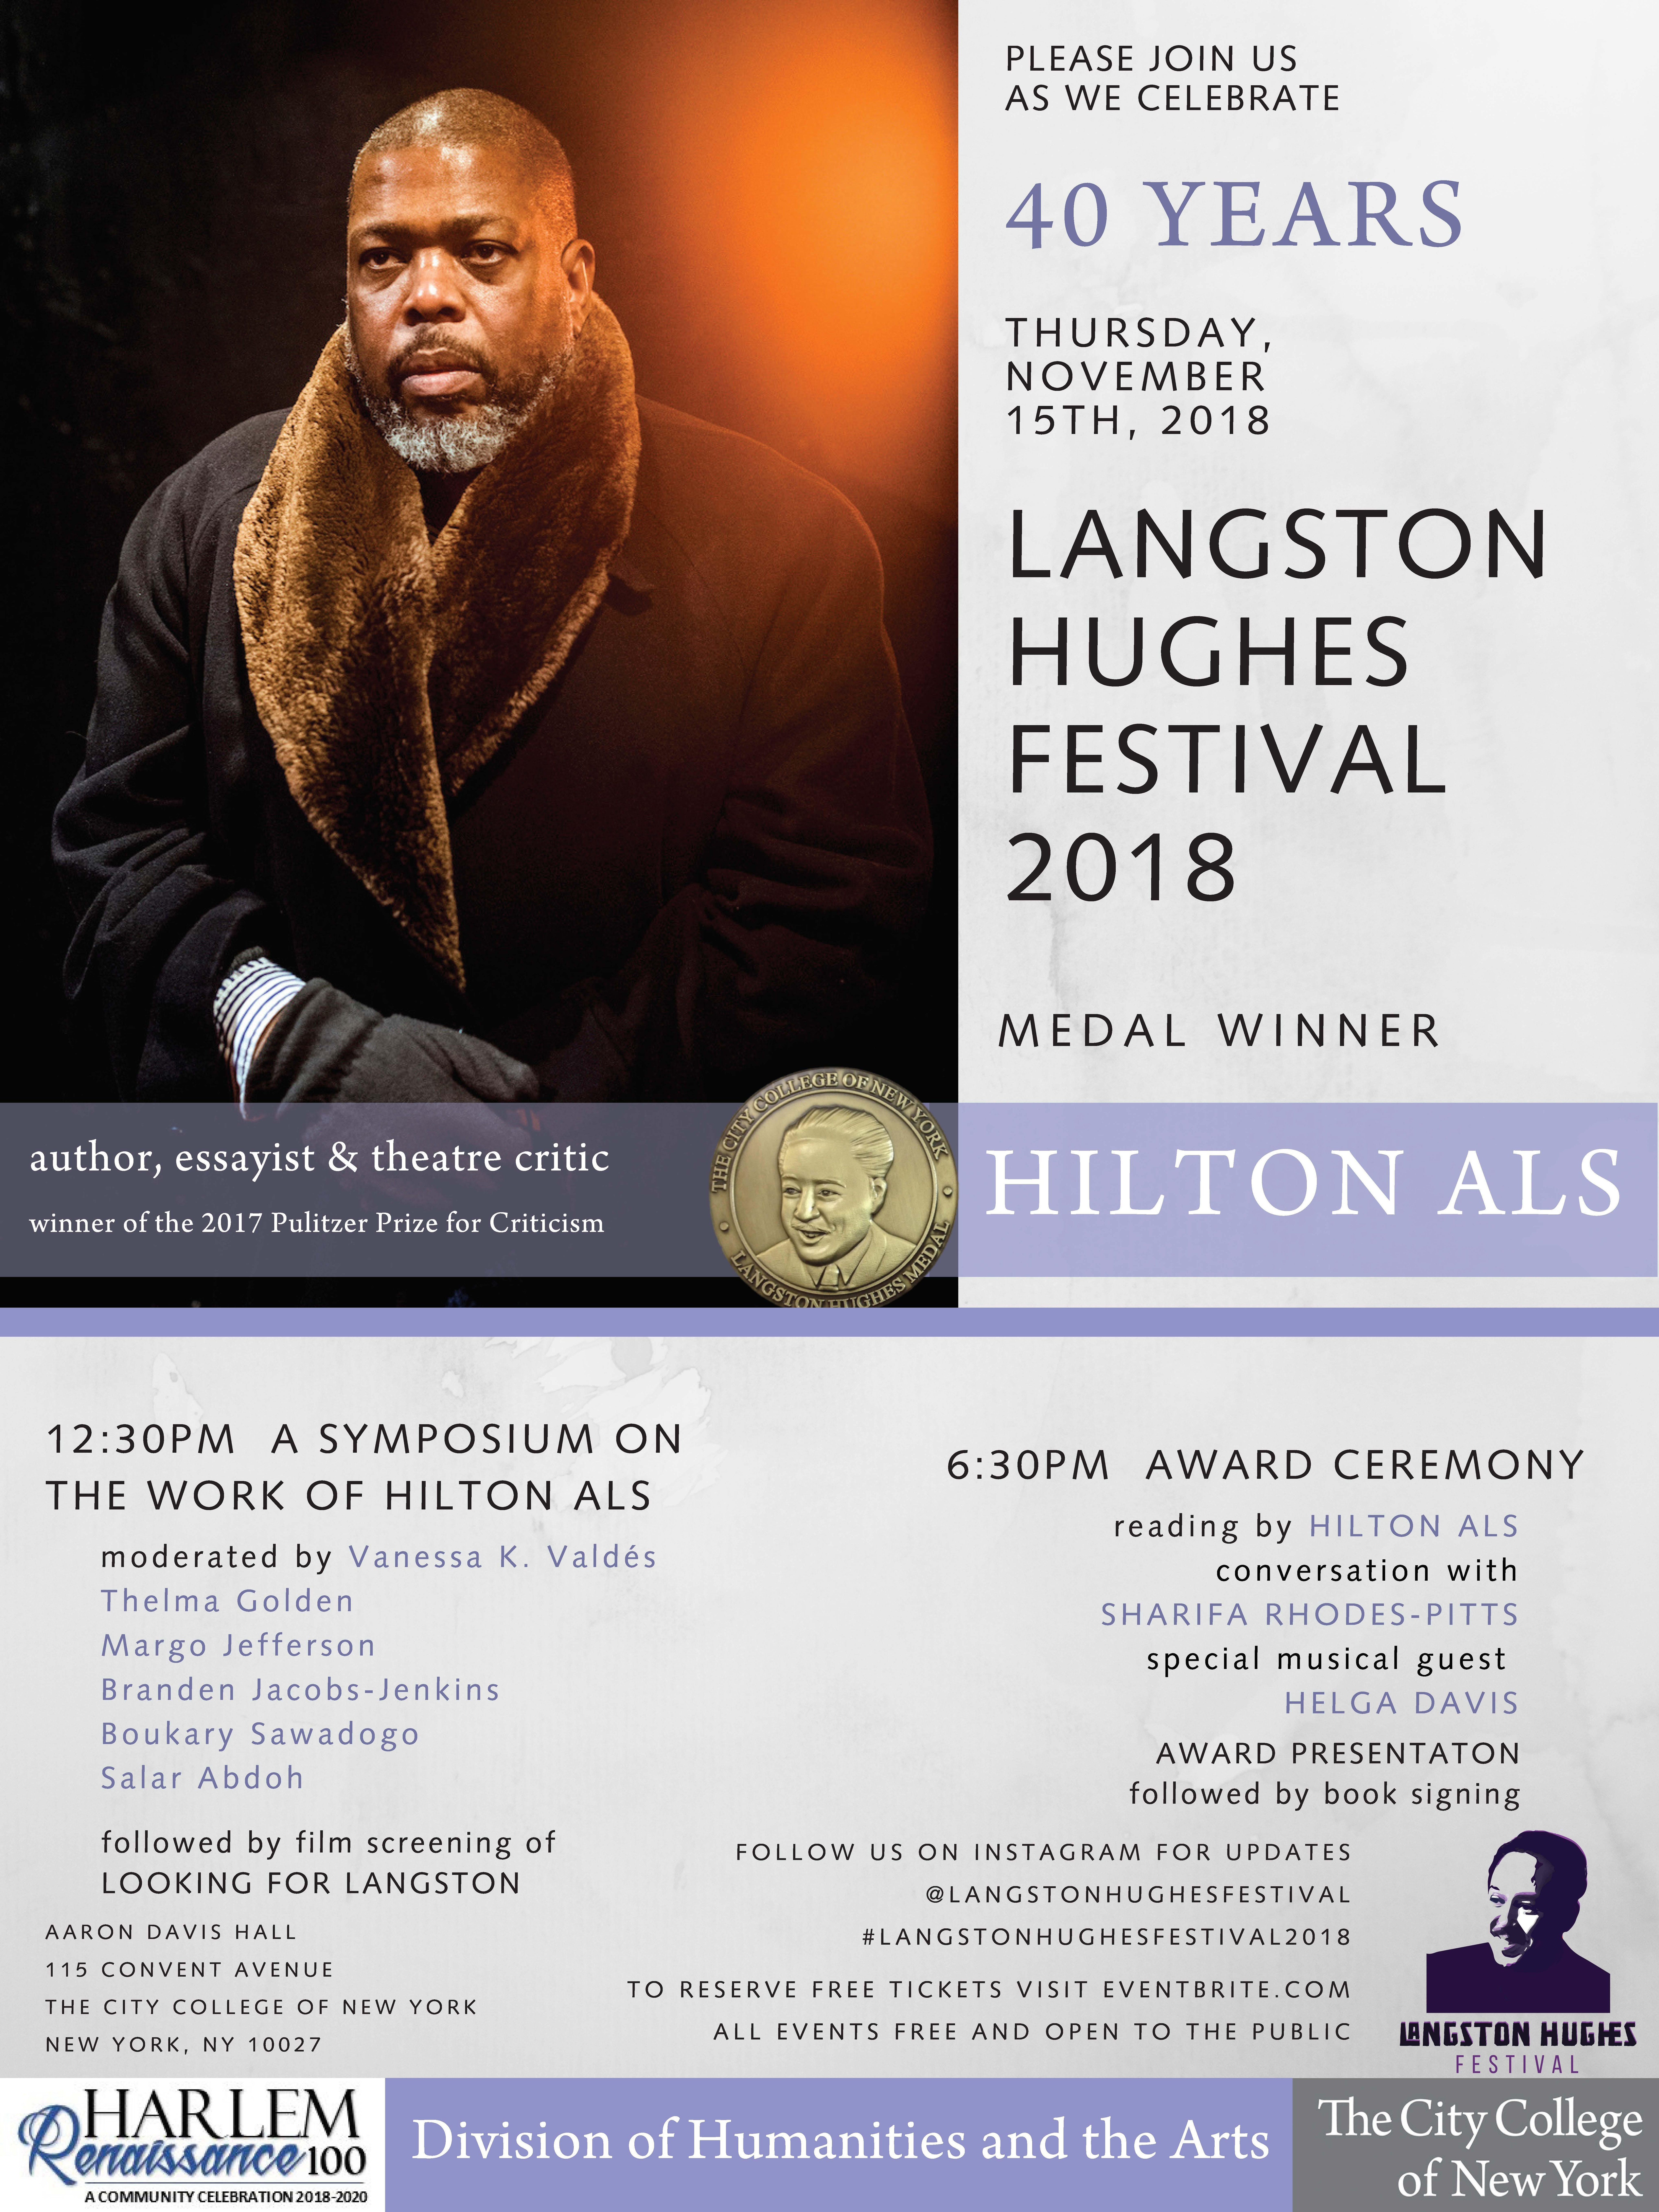 Langston Huse Festival 40th year